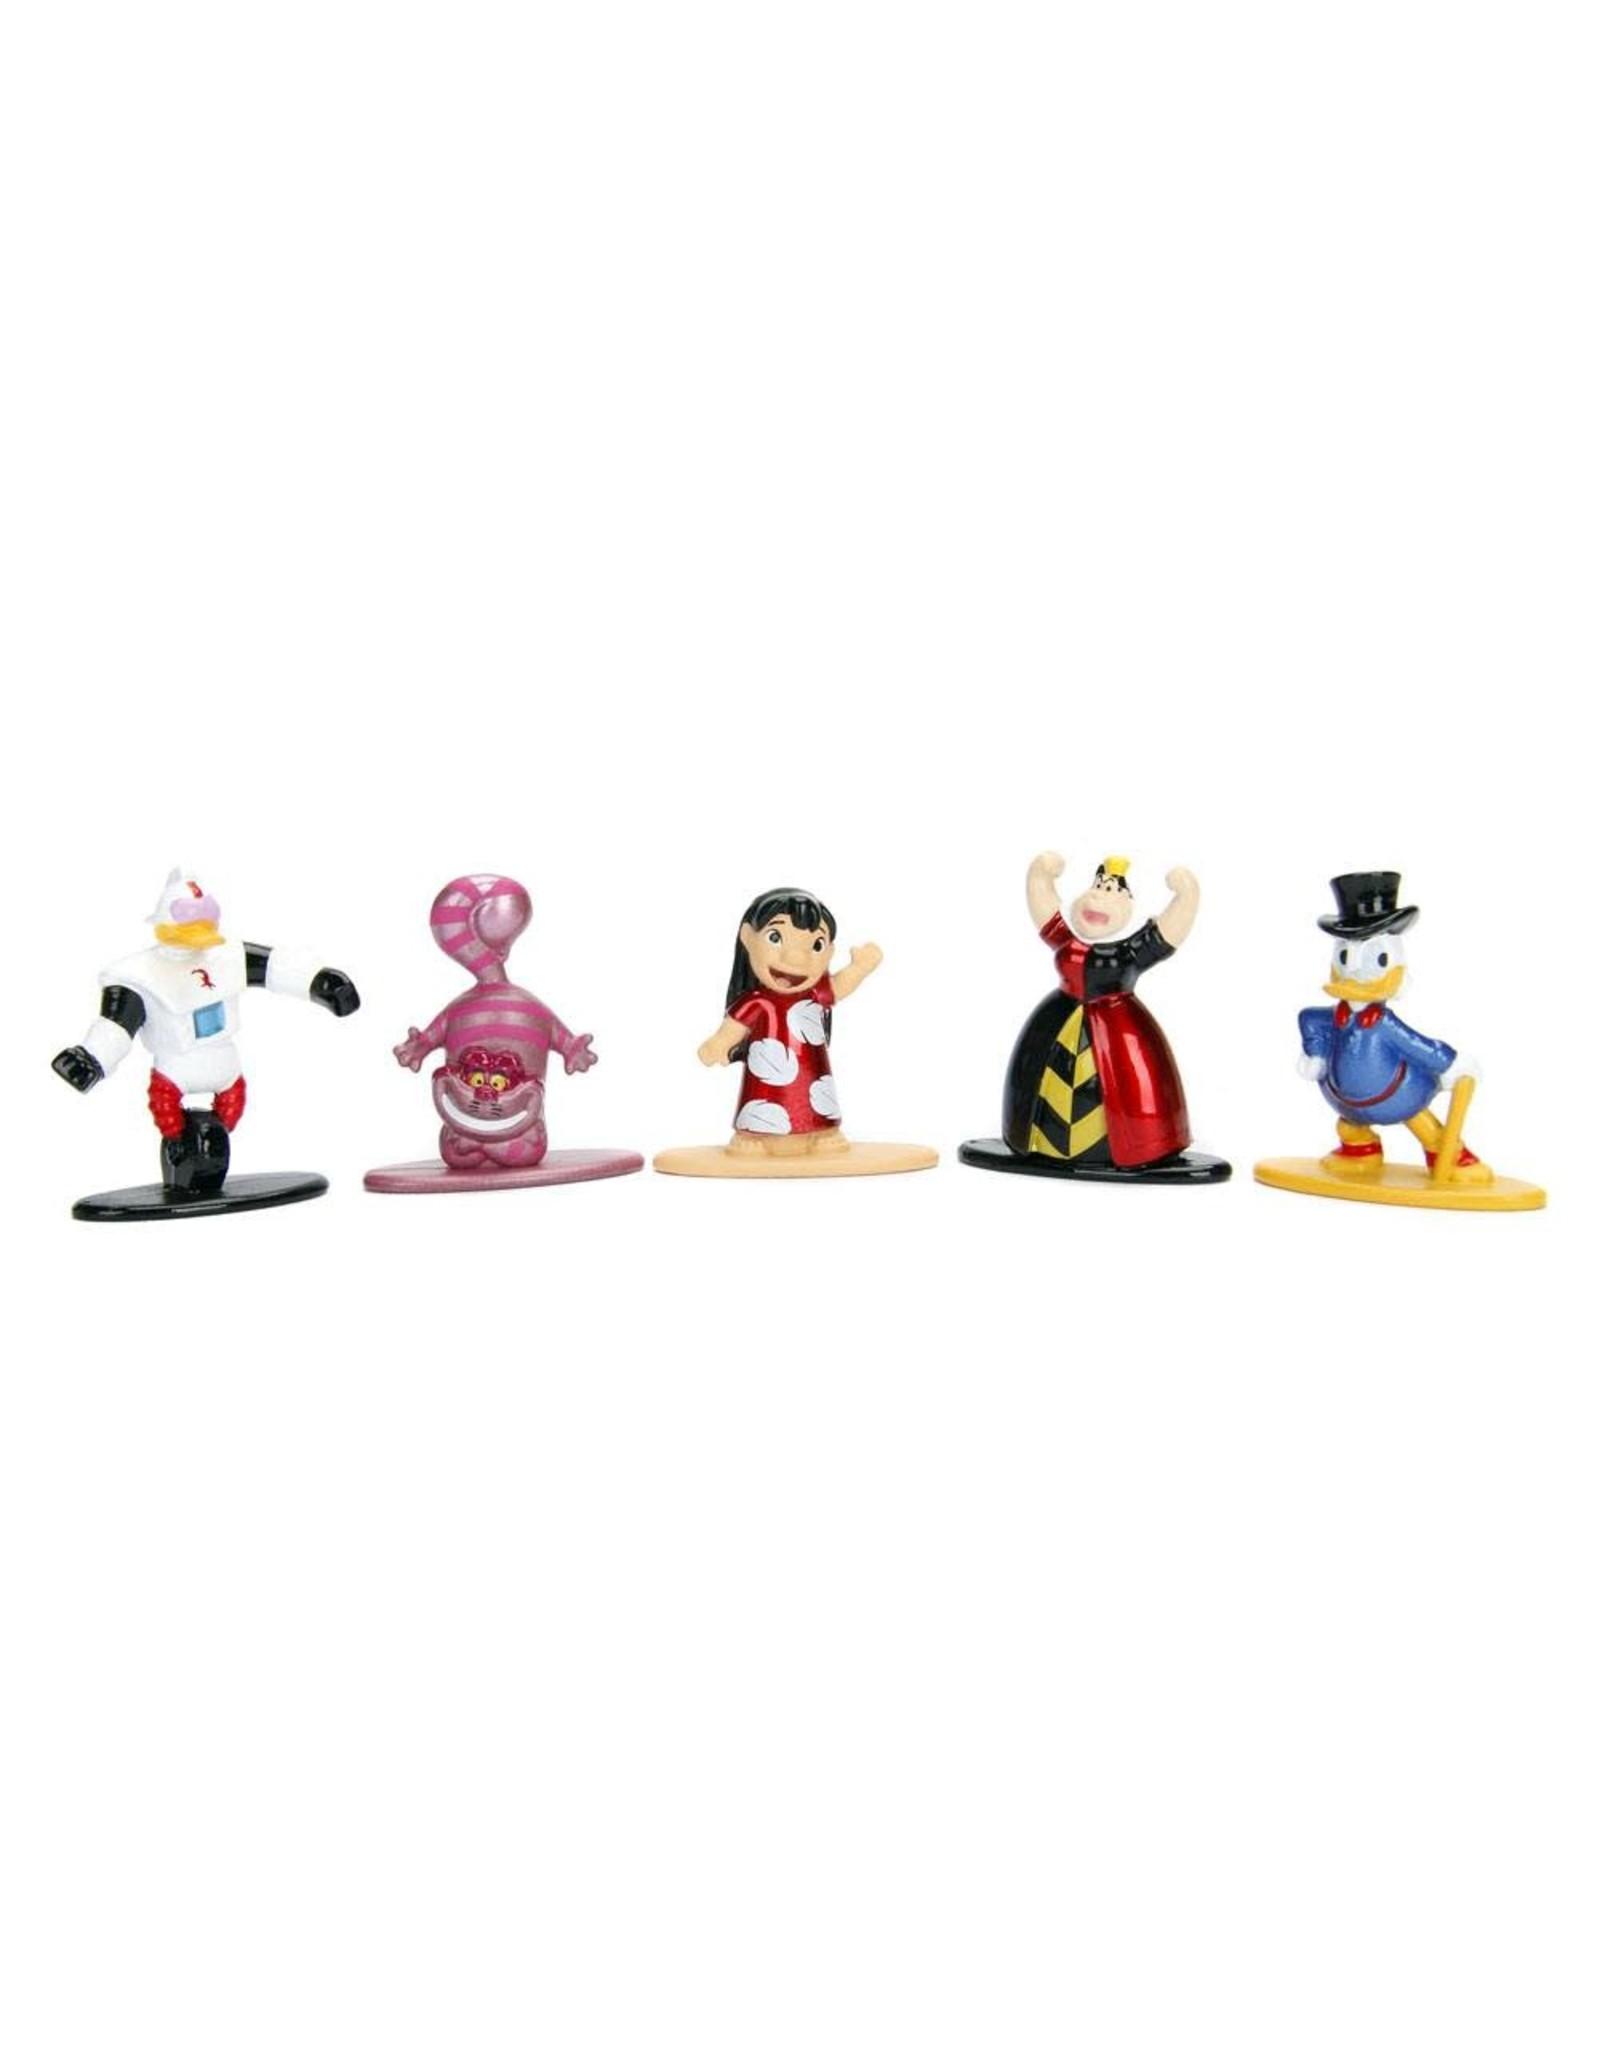 Jada Toys DISNEY Nano Metalfigs Diecast Mini Figures 5-Pack Wave 2 4 cm